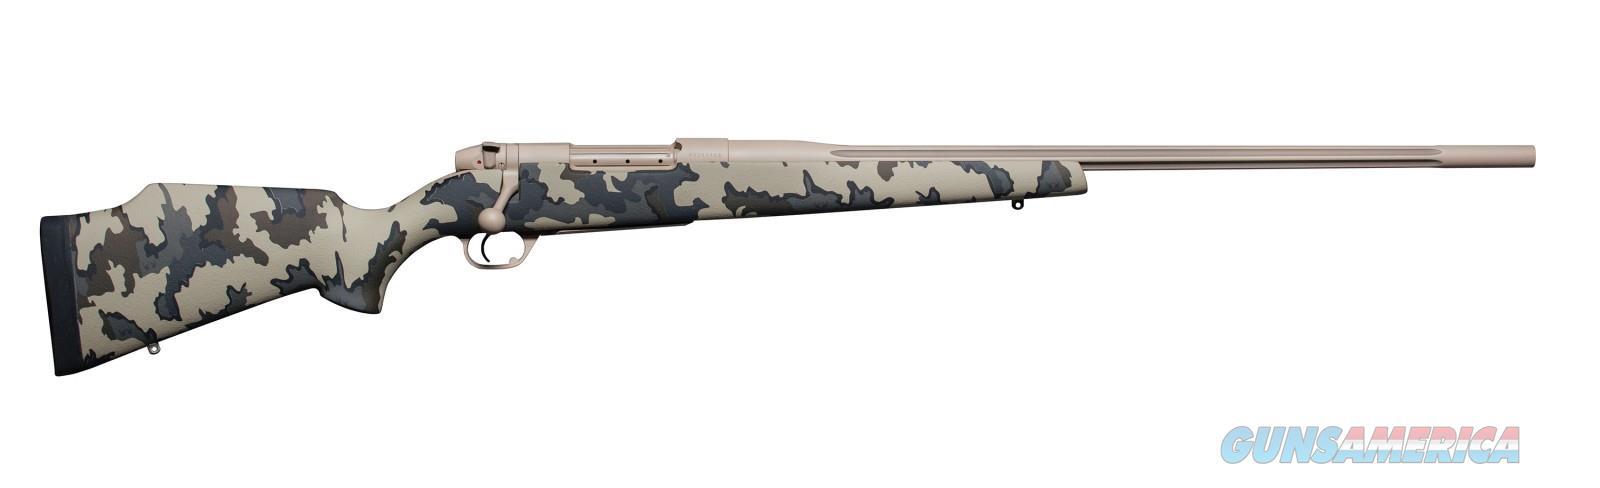 "Weatherby Mark V Arroyo RC .270 Wby Mag 26"" KUIU Vias MAYM270WR6O  Guns > Rifles > Weatherby Rifles > Sporting"